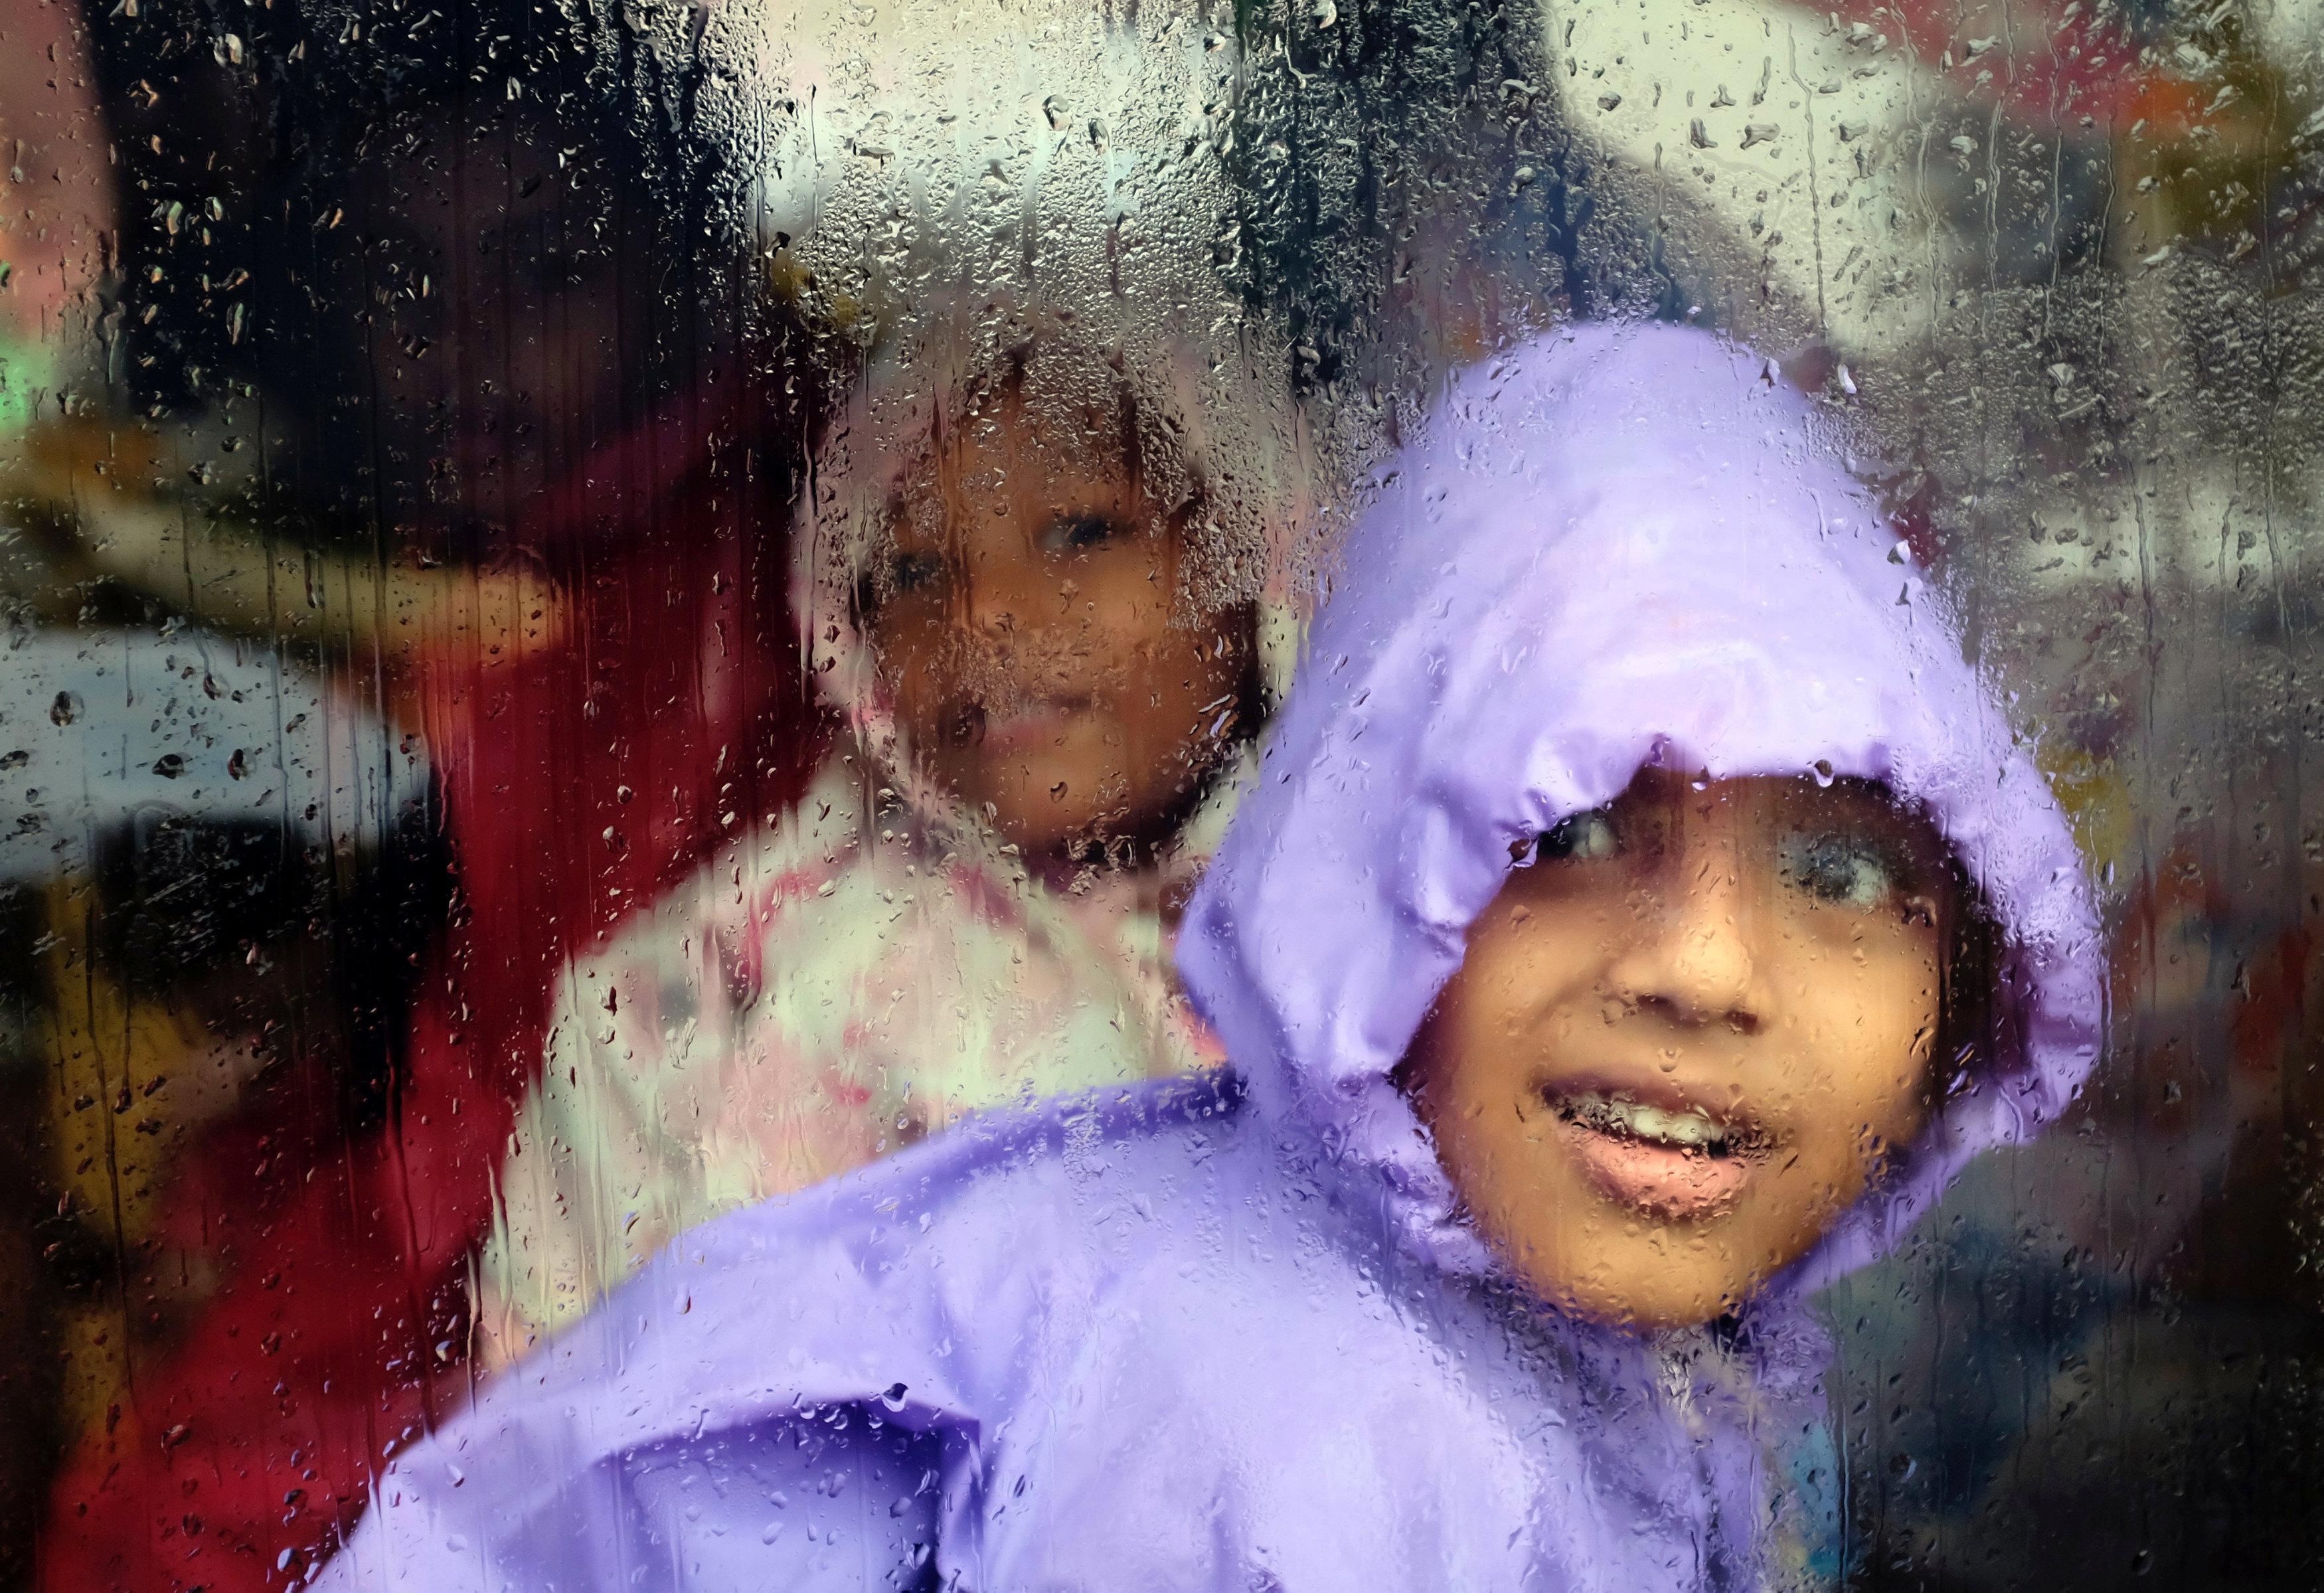 Rains continue to hit Mumbai metropolitan region for 4th day